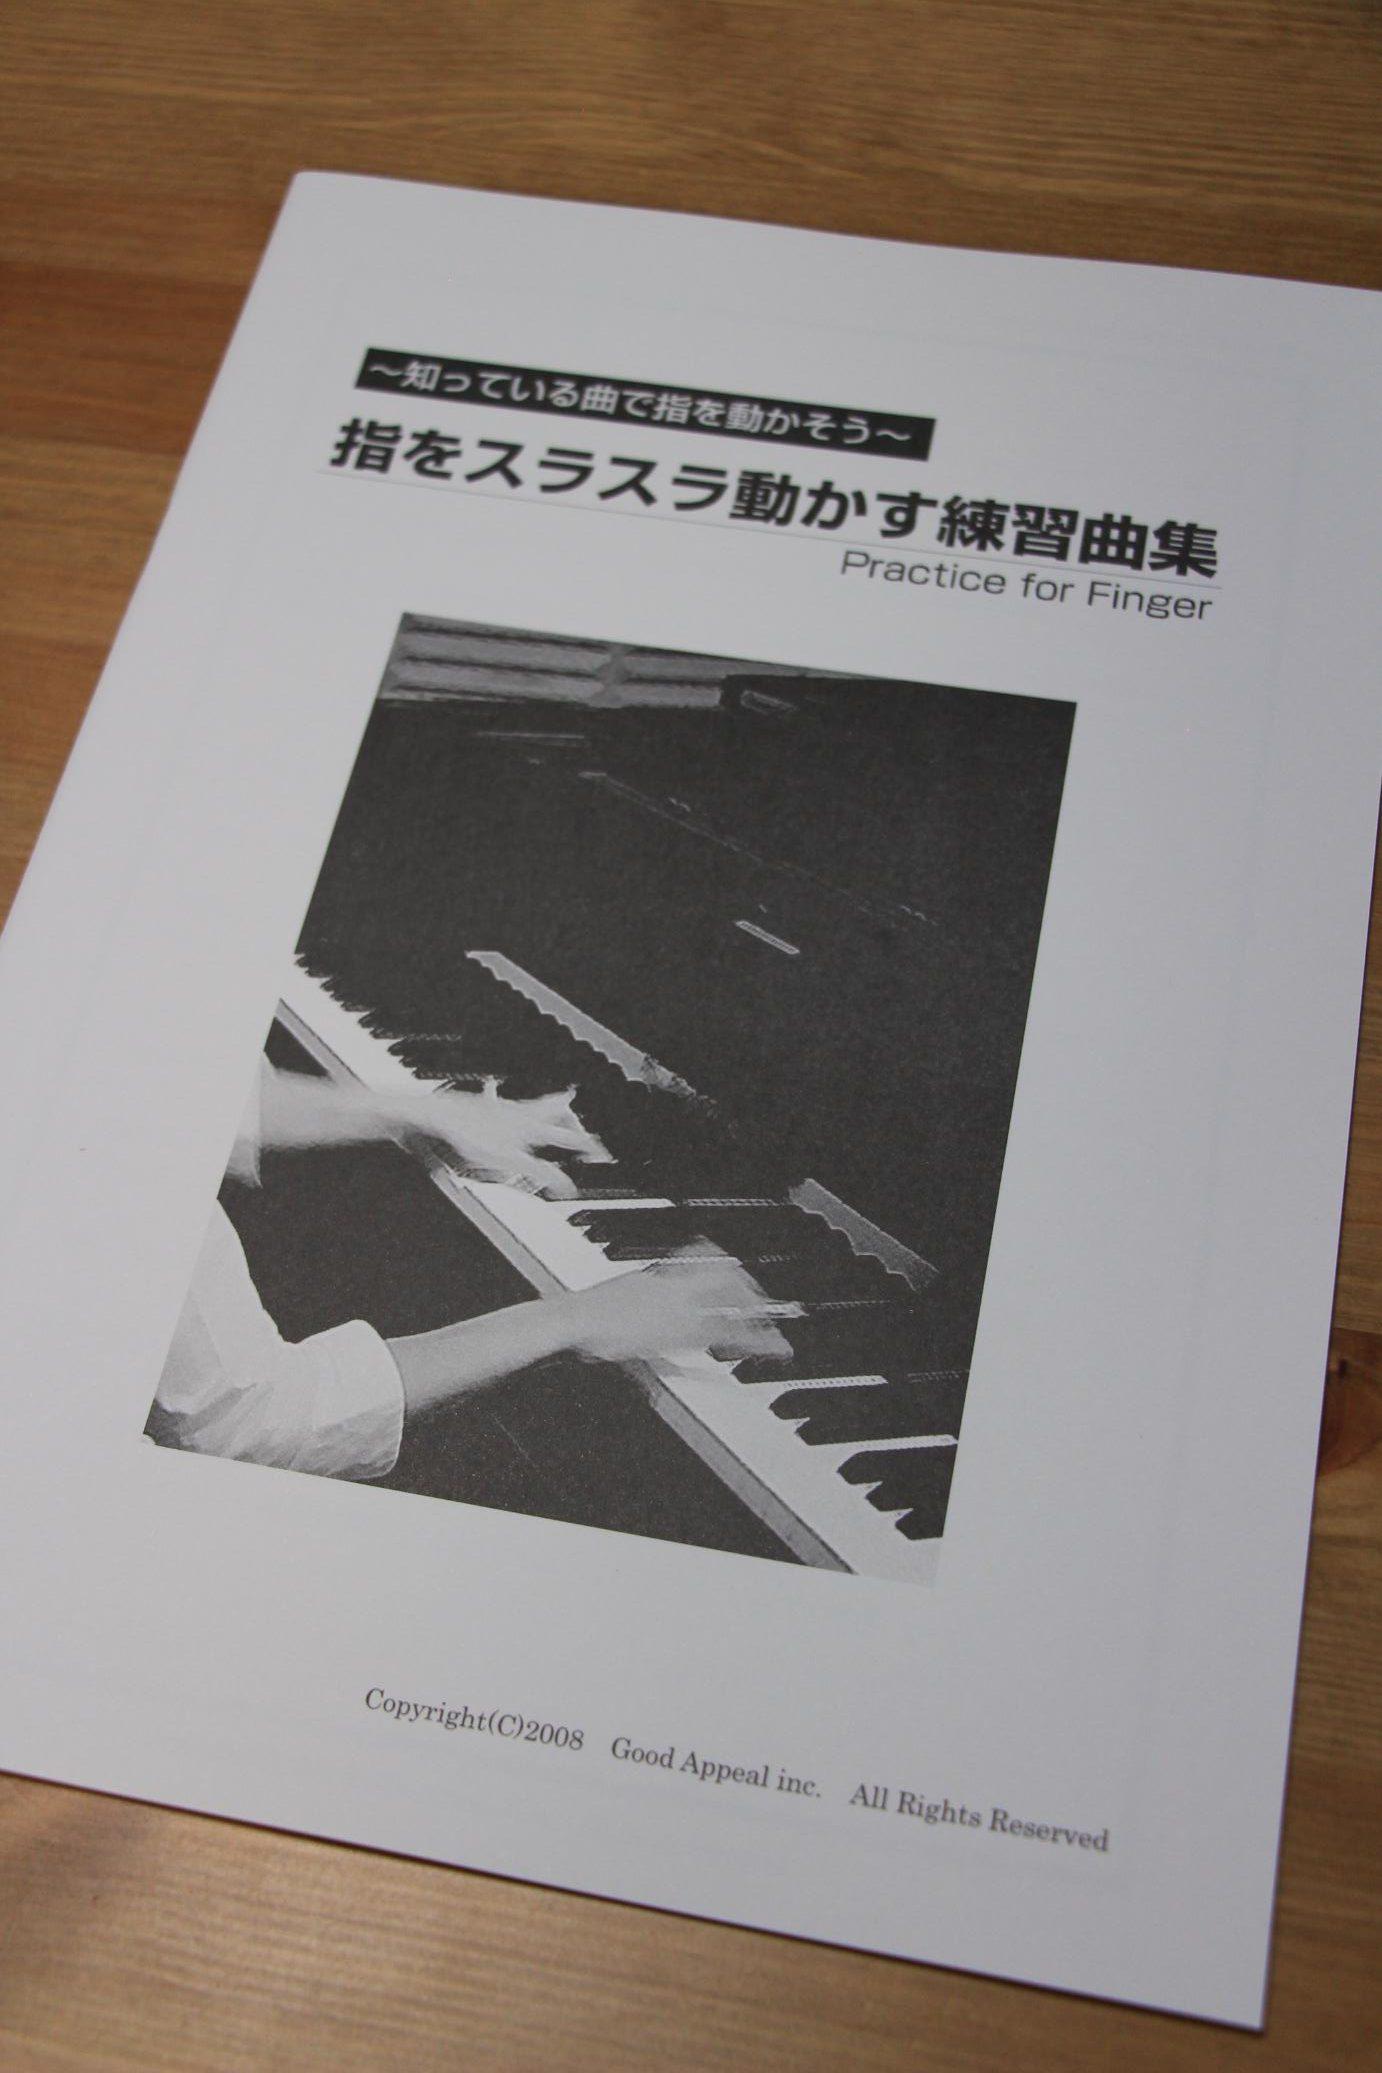 指の練習楽譜